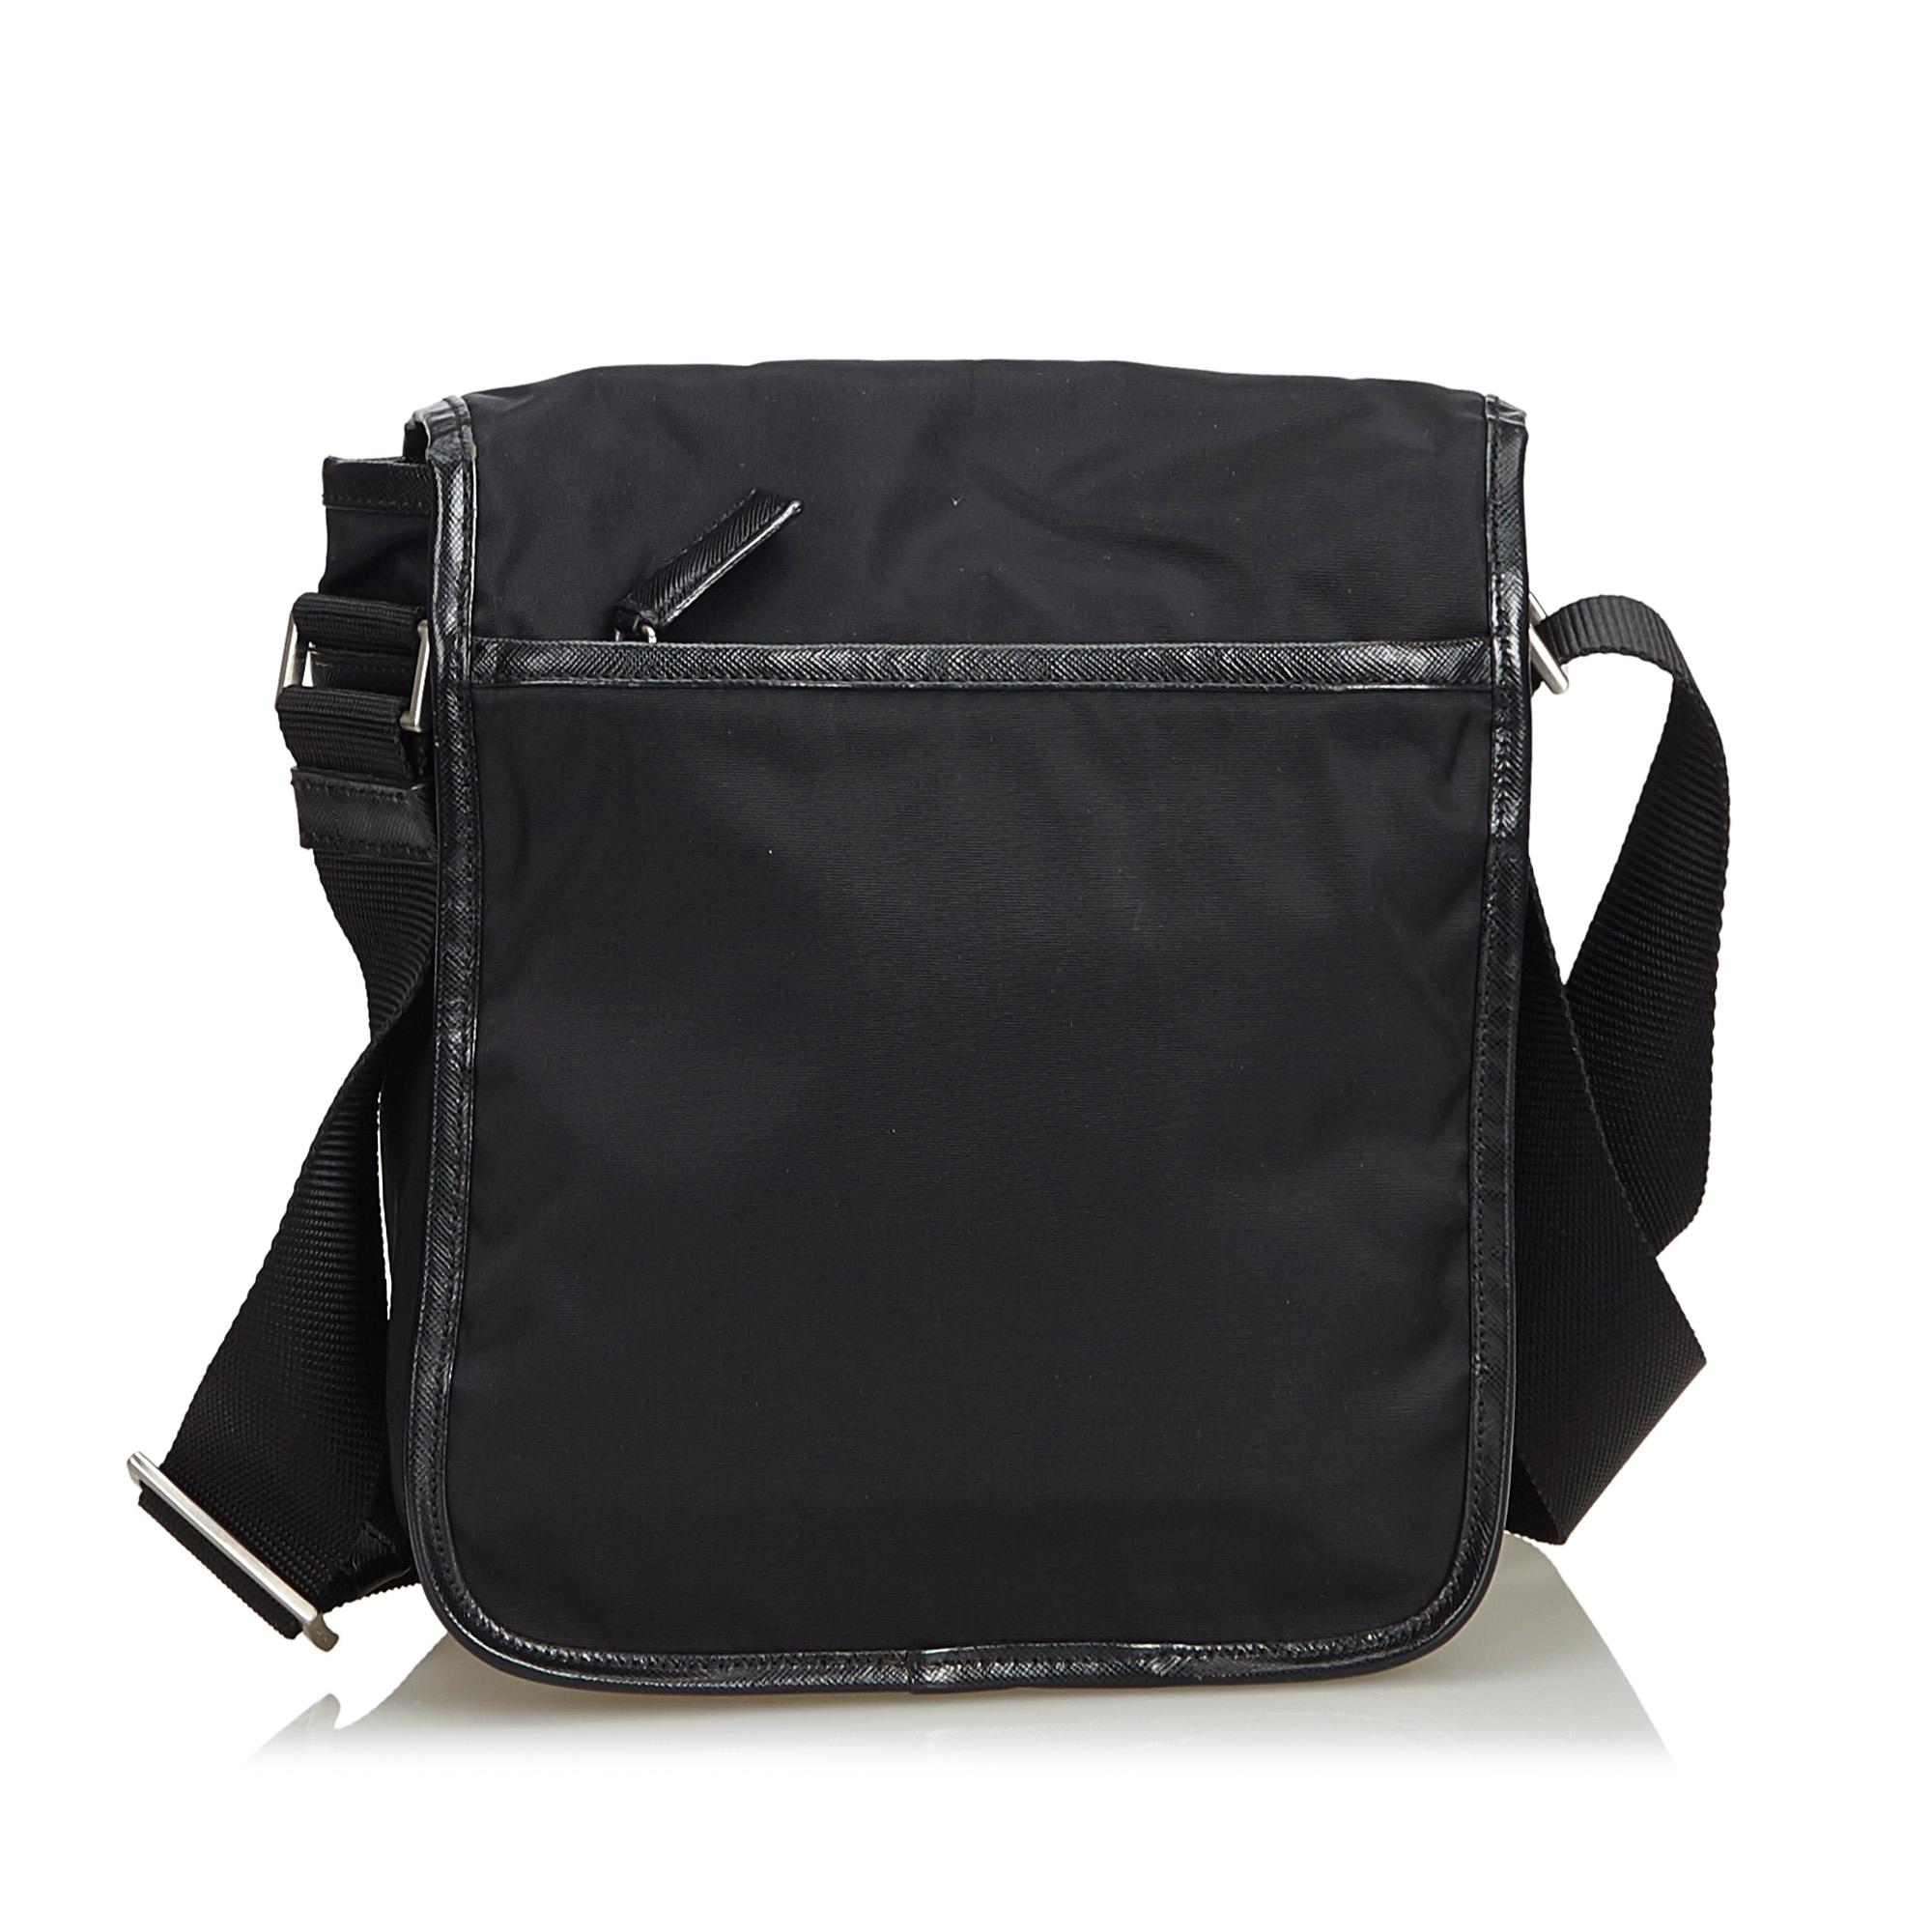 03aa687332 Vintage Prada Black Nylon Fabric Crossbody Bag Italy 3 3 of 12 ...